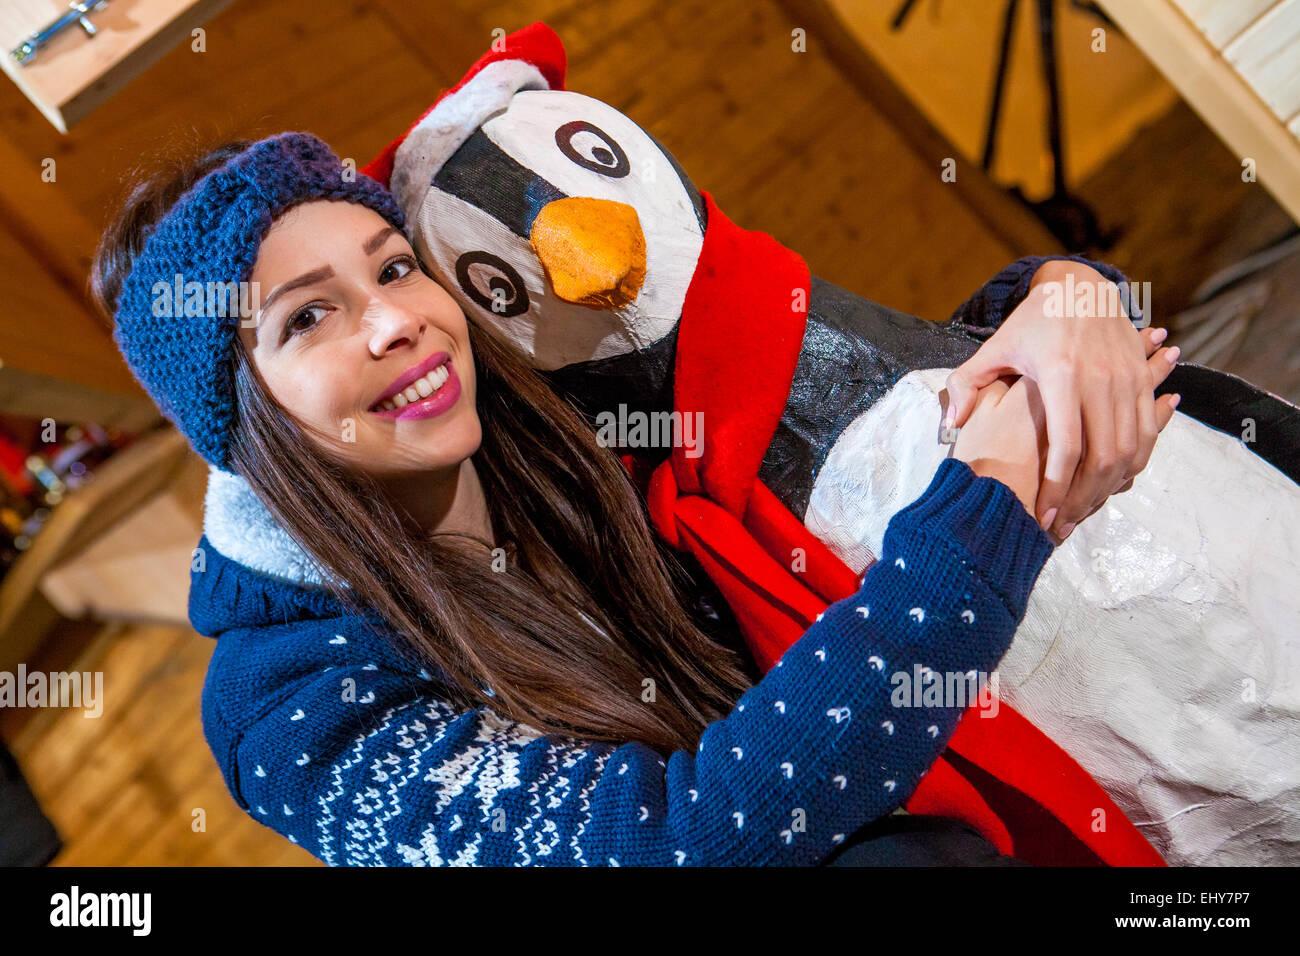 Mujer joven posando con penguin figurilla Imagen De Stock